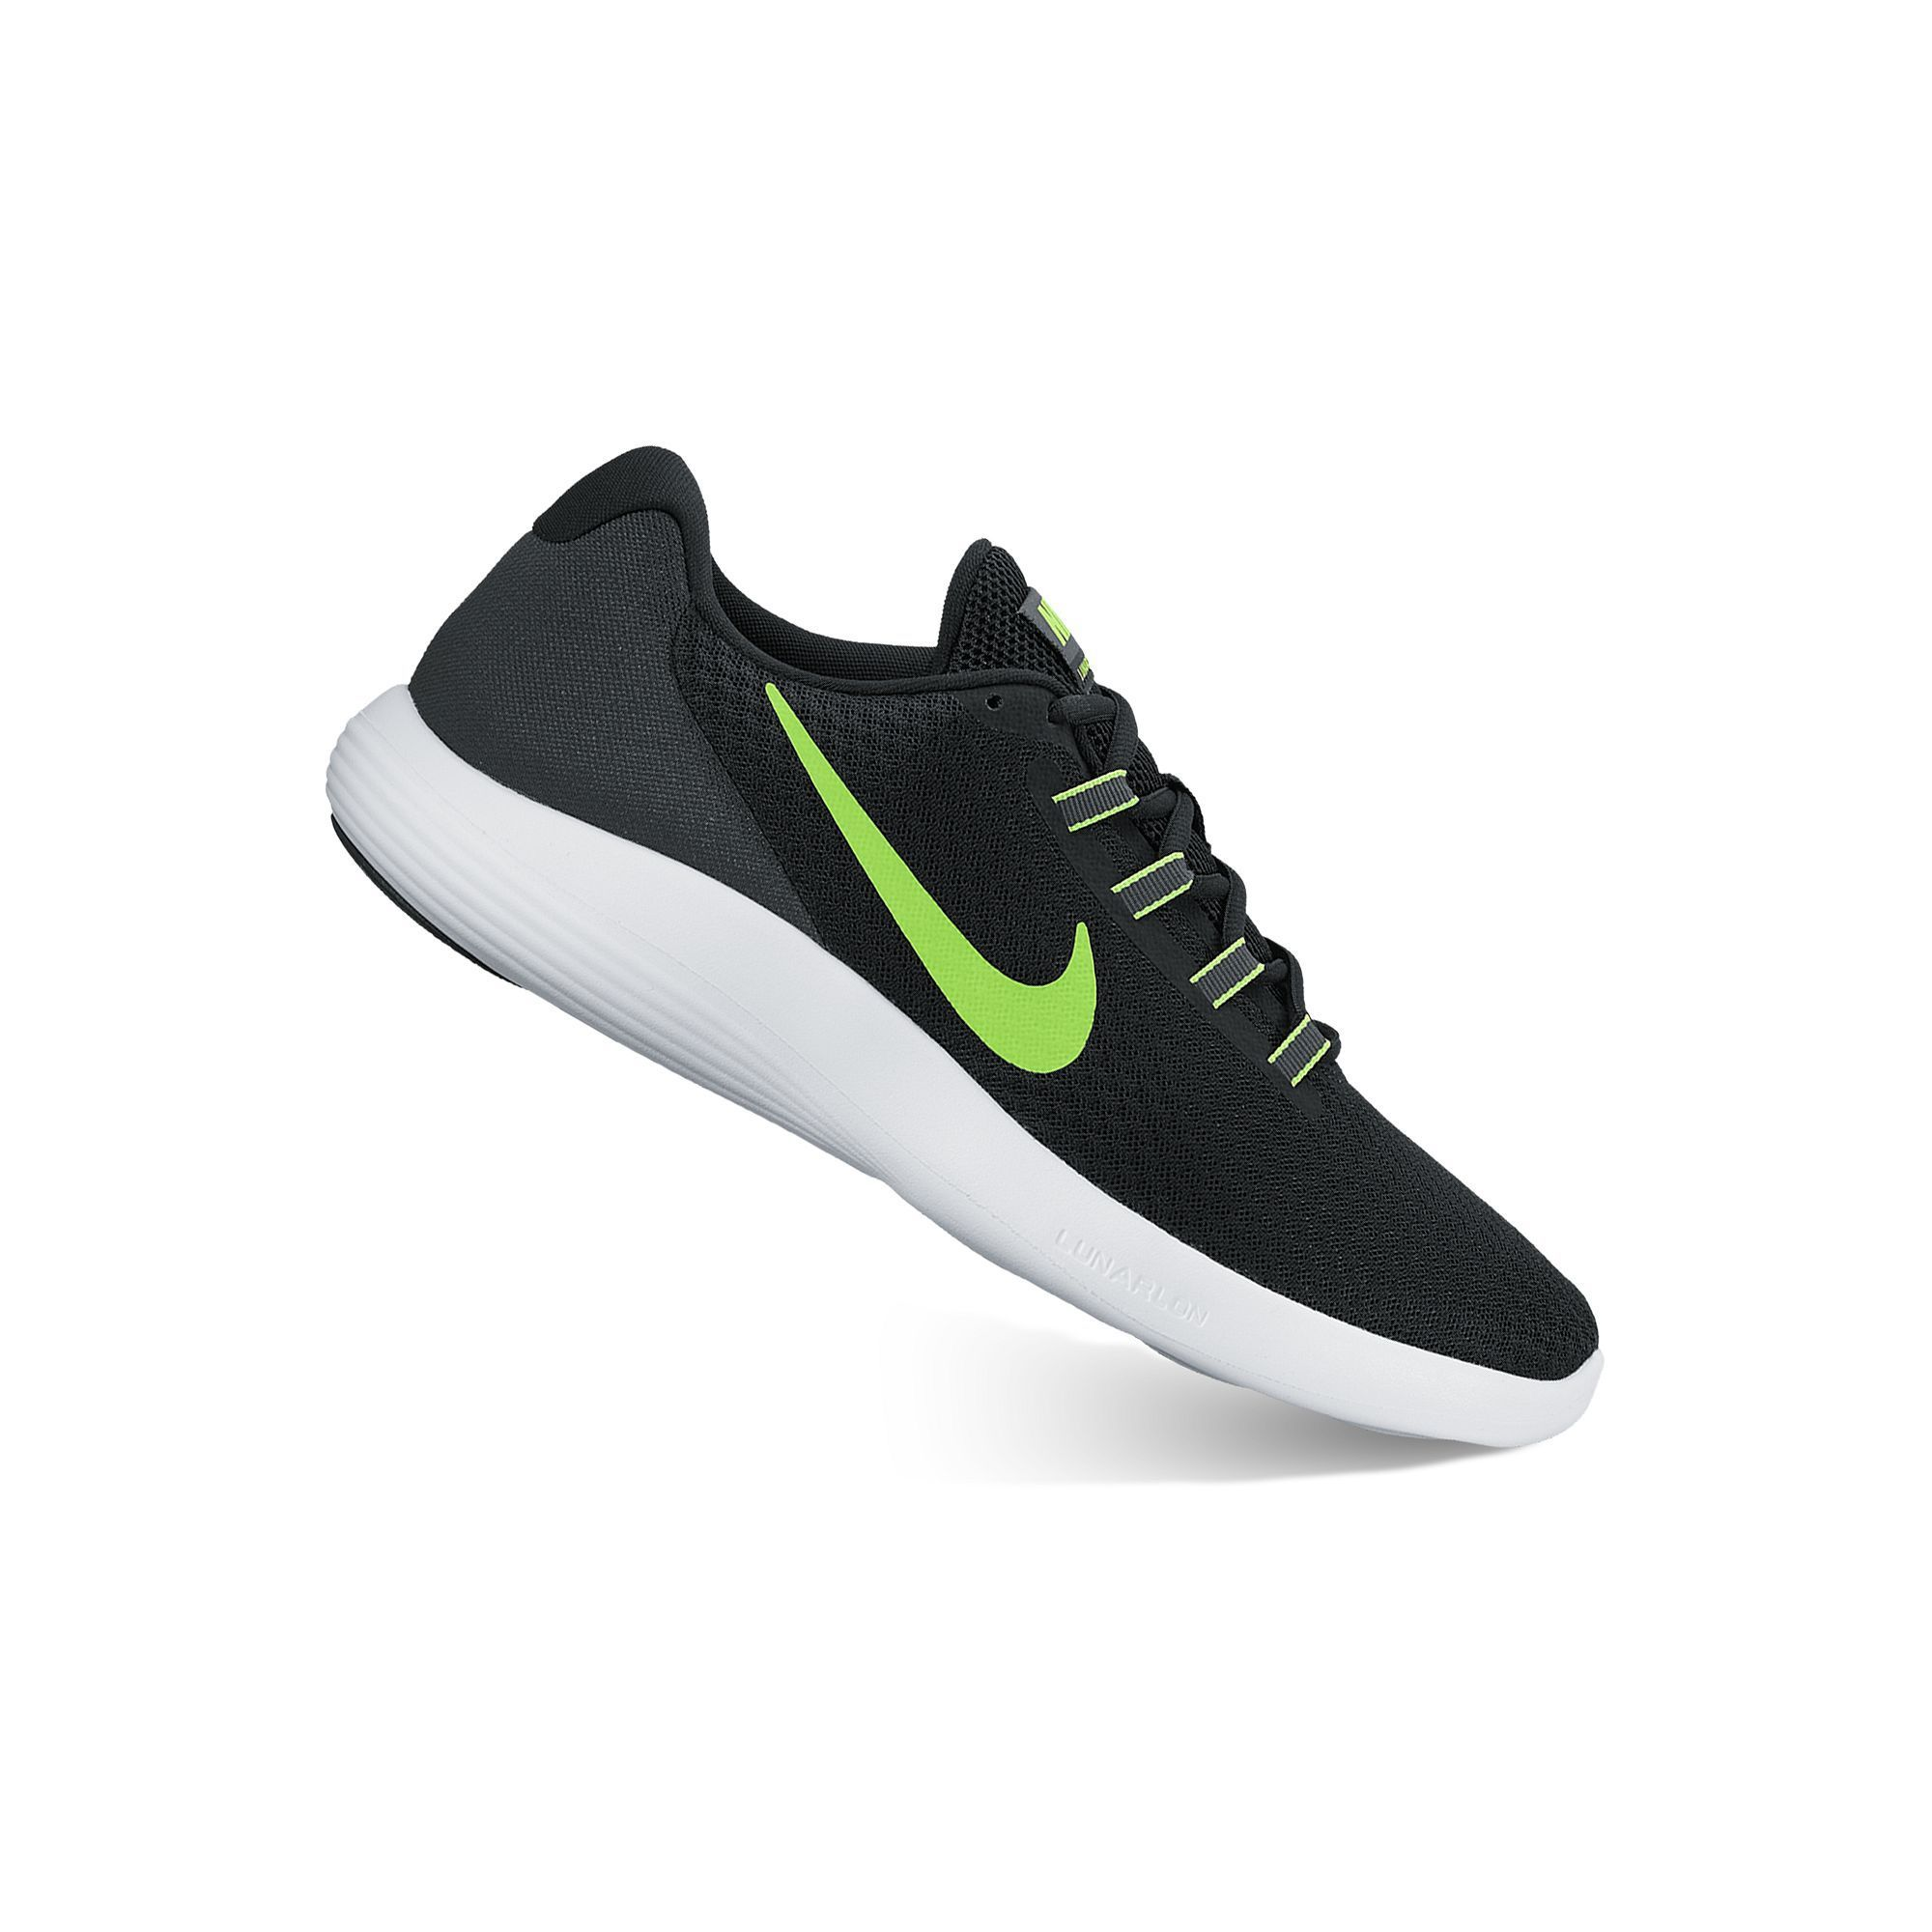 Nike LunarConverge Men s Running Shoes 788fb413d